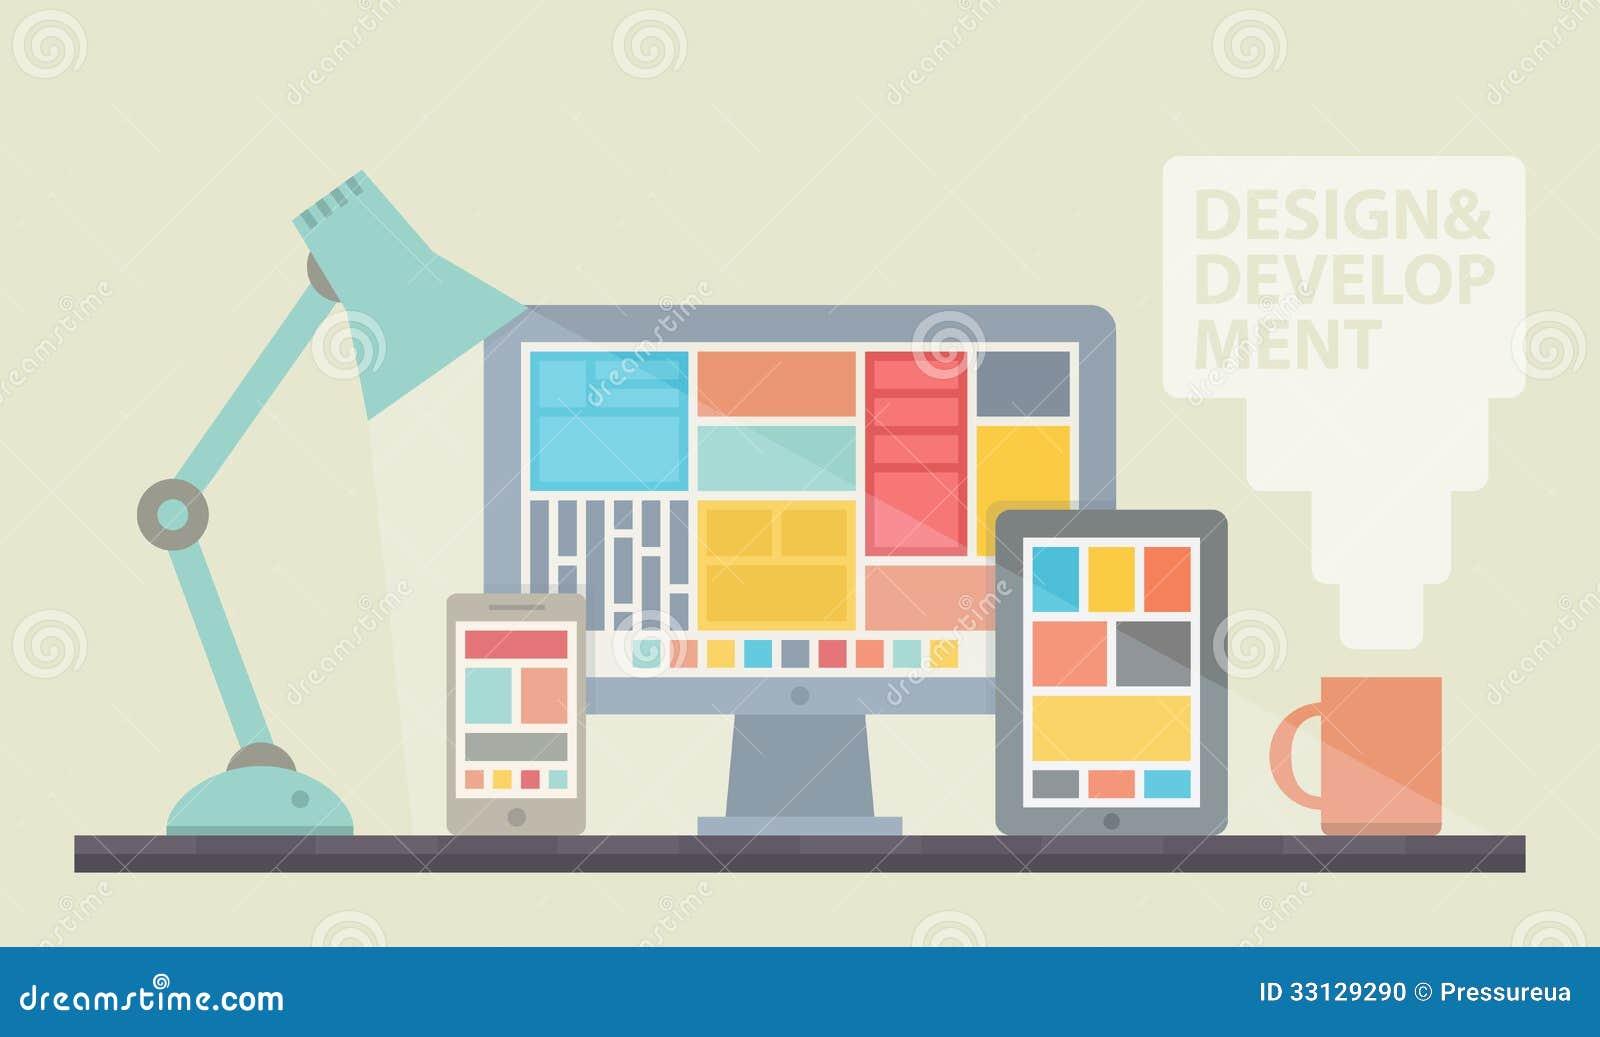 Web Design Development Illustration Stock Photo - Image: 33129290